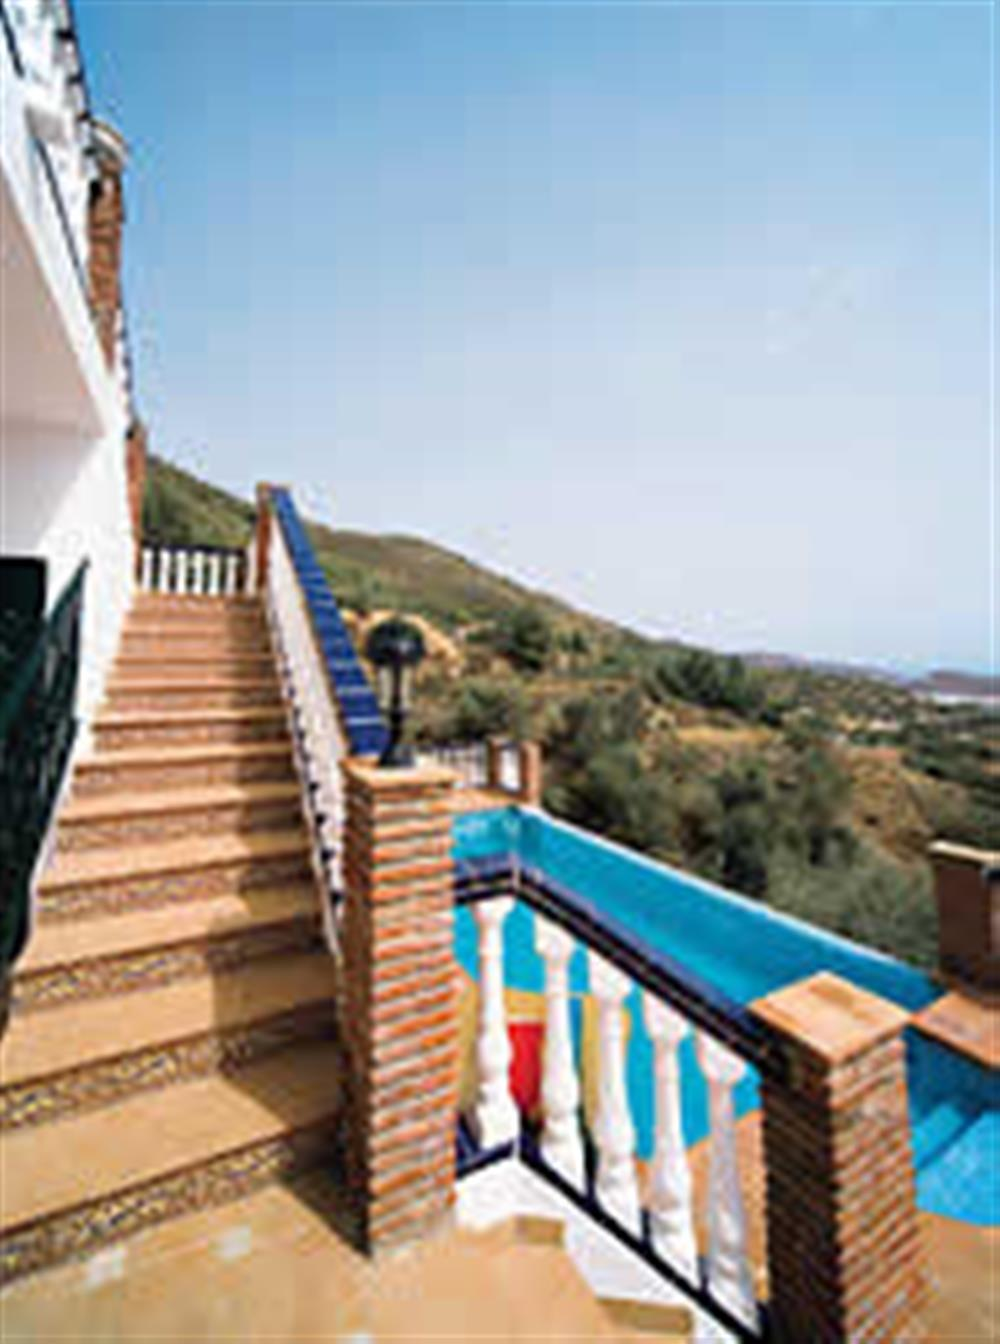 Staircase, pool at Villa El Pedregal, Mainland Spain, Spain